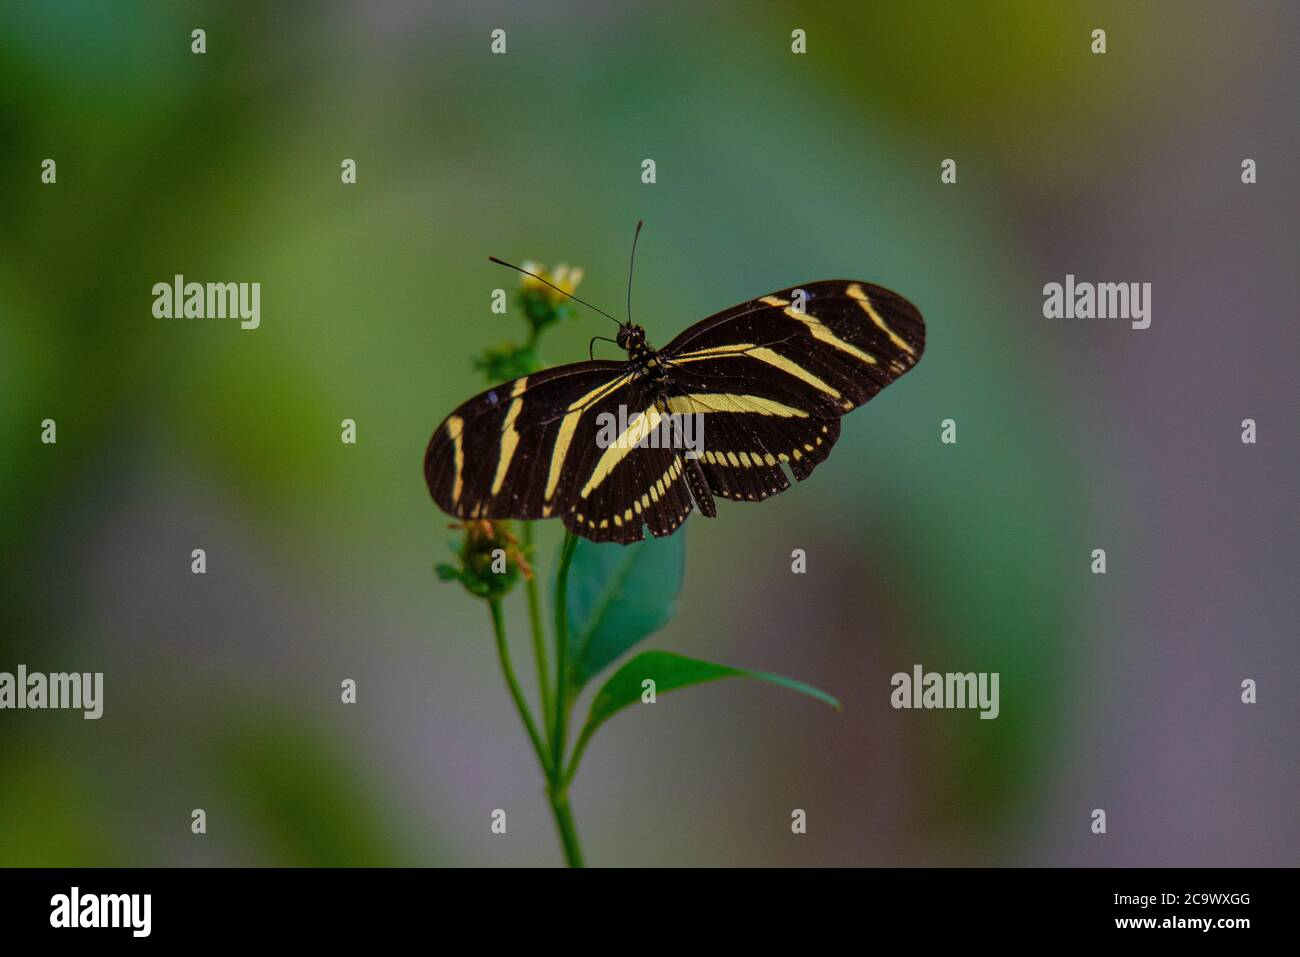 Mariposa de ala larga Zebra descansando en una planta Foto de stock